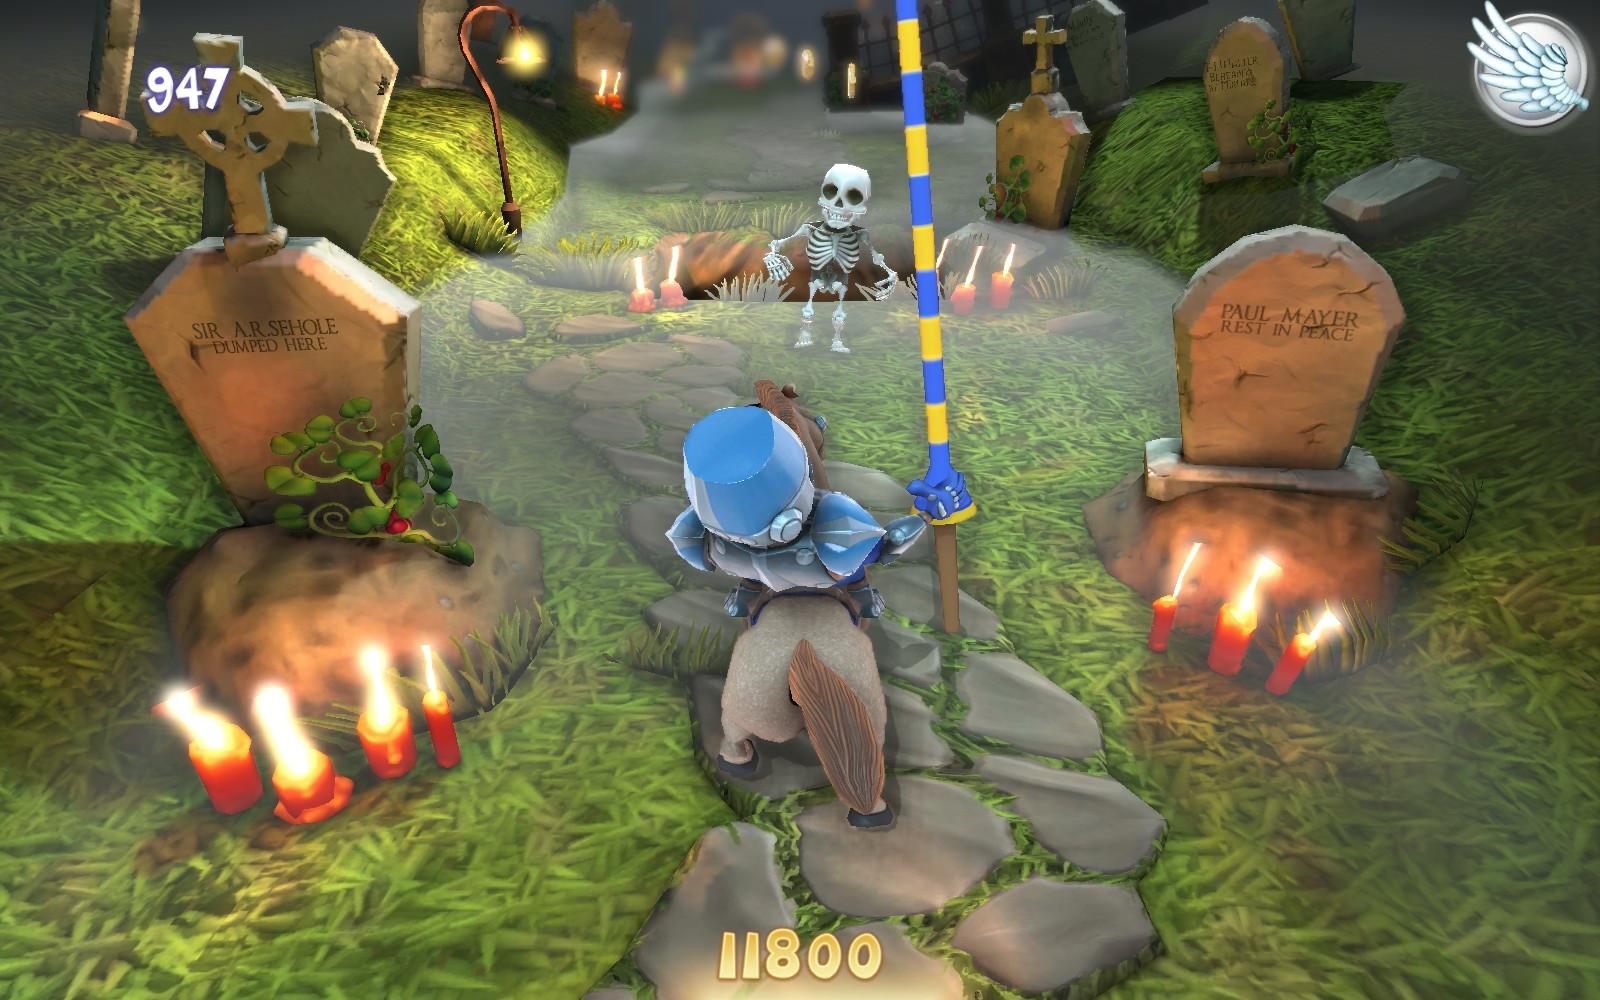 The Graveyard theme